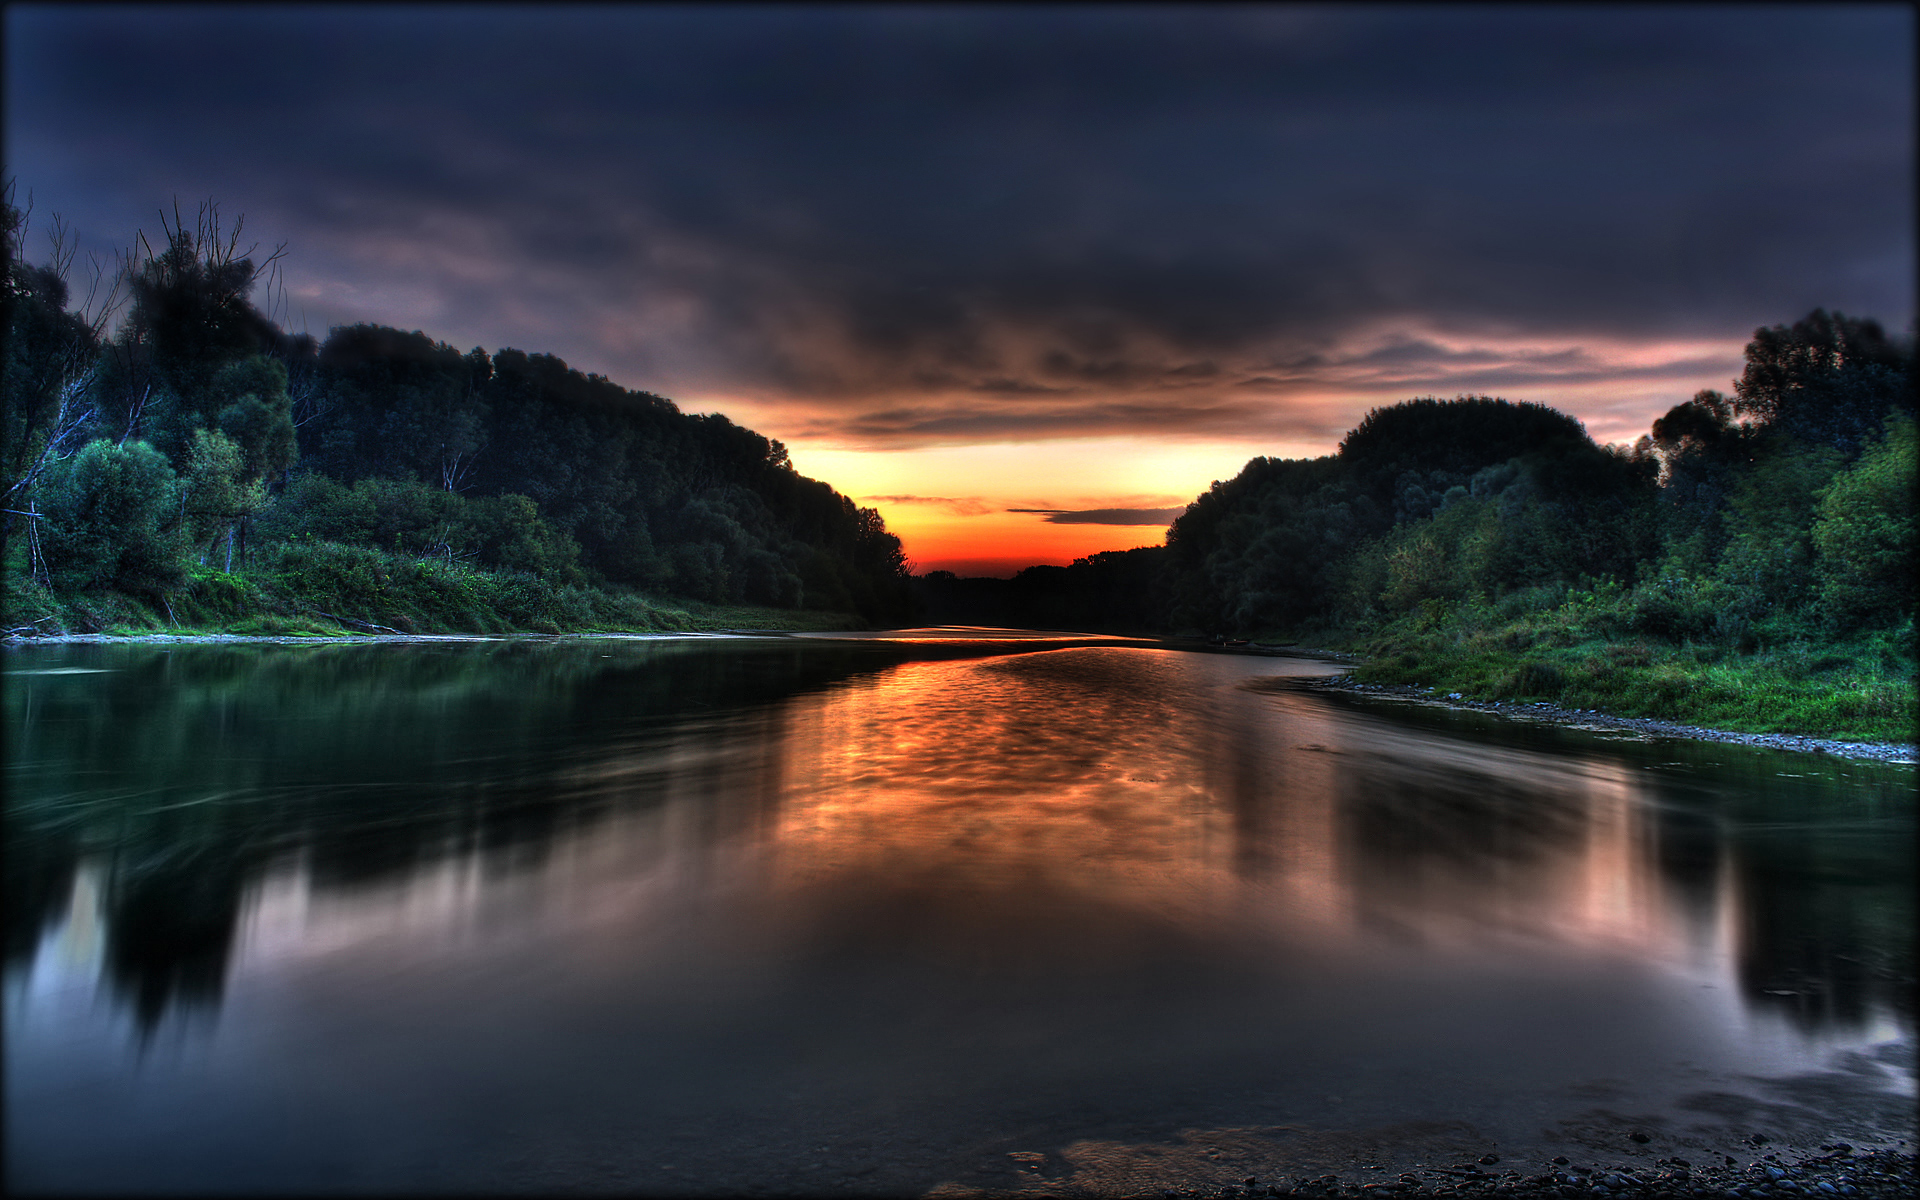 http://fc05.deviantart.net/fs41/f/2009/047/5/a/Donau_sunrise_2_HDR_by_tienod.jpg